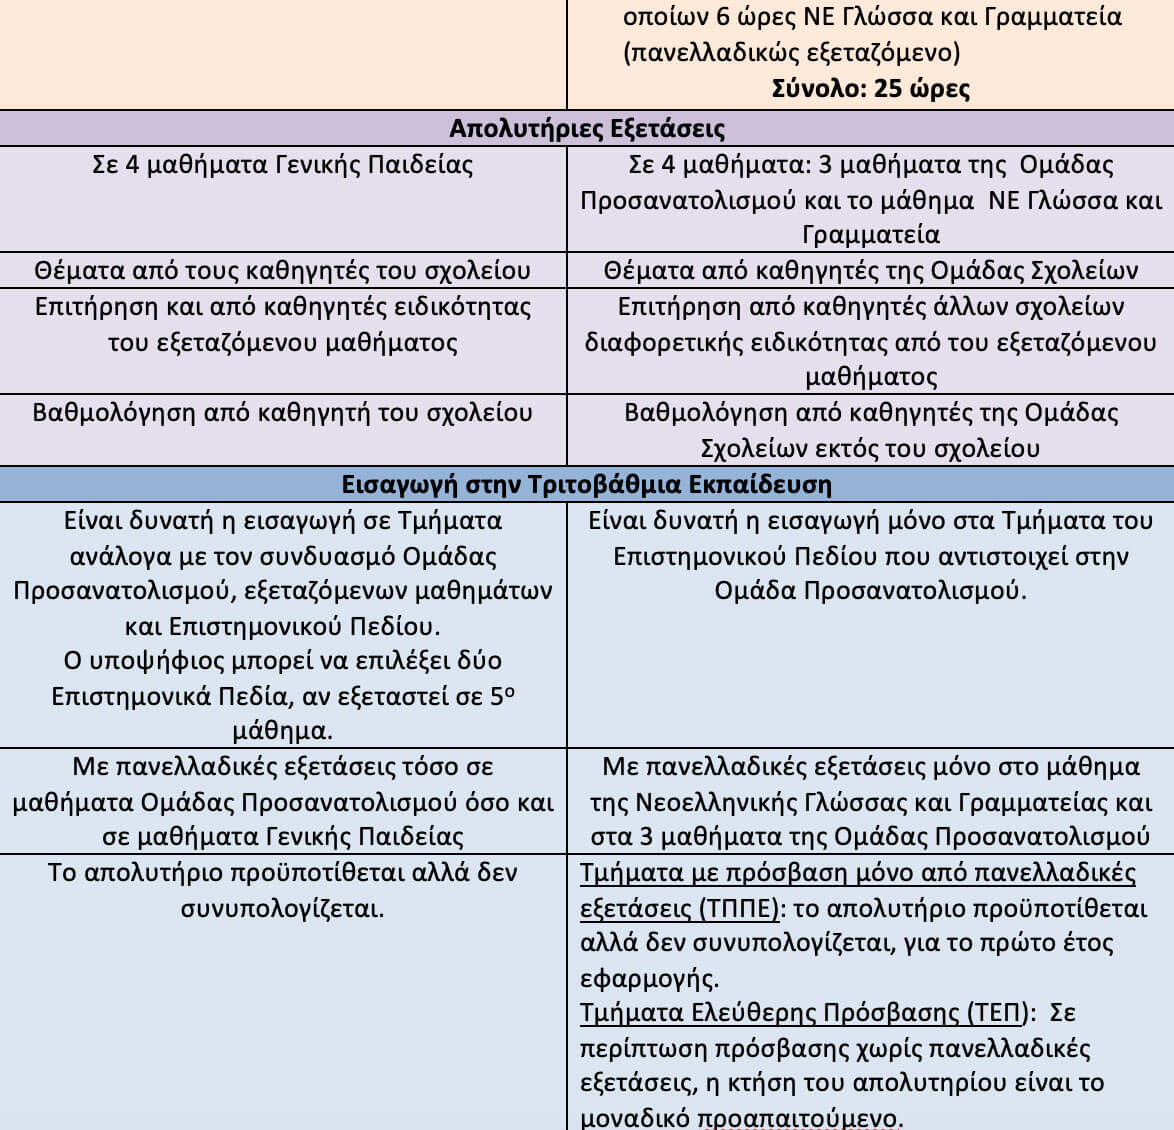 panelladikes2 ΥΠΟΥΡΓΕΙΟ ΠΑΙΔΕΙΑΣ ΠΑΝΕΛΛΑΔΙΚΕΣ 2019